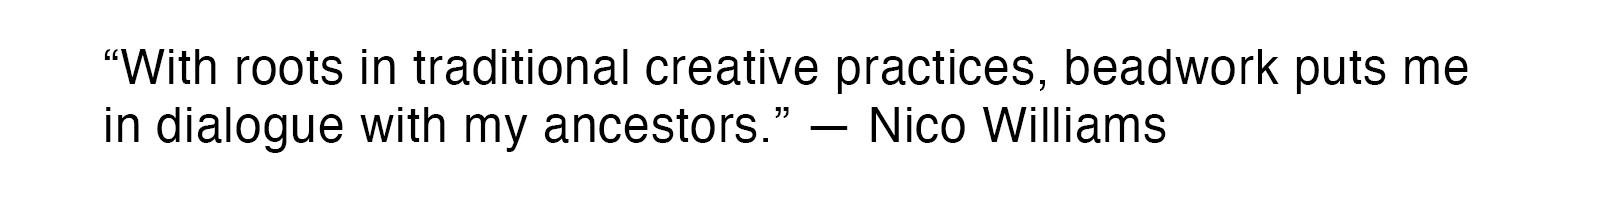 nicowilliamstext2